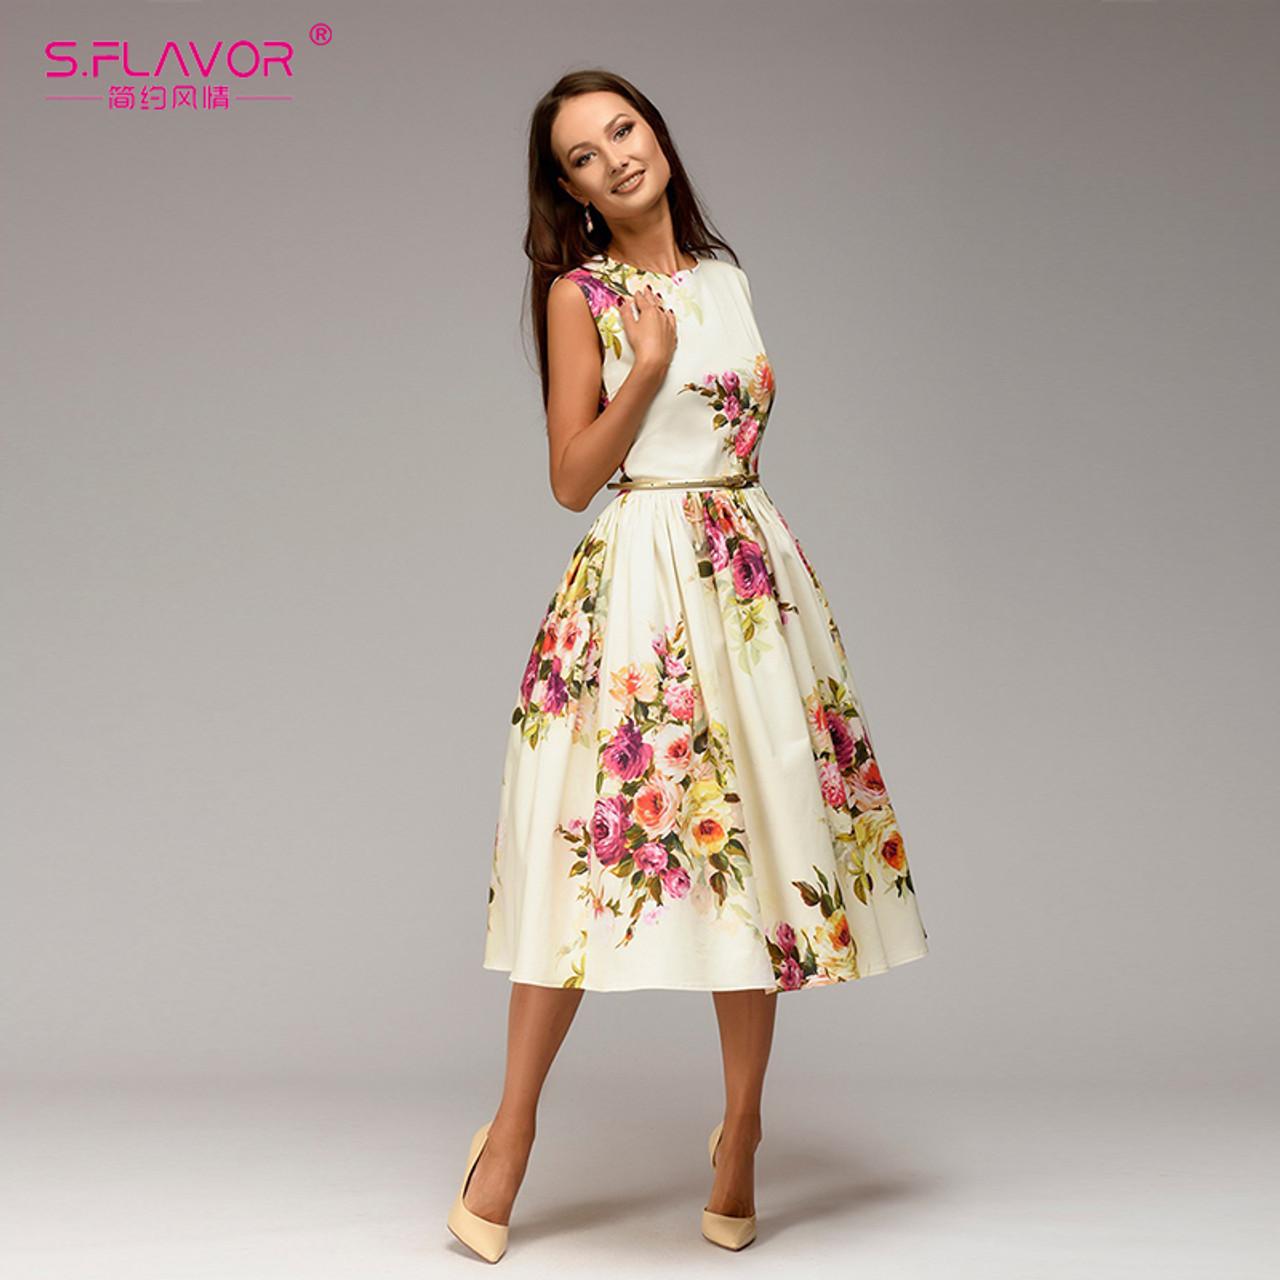 13e99291377fd S.FLAVOR Lady party dress Hot sale Spring Summer women sleeveless flowers  printing vestidos Elegant casual A-line dress No Belt